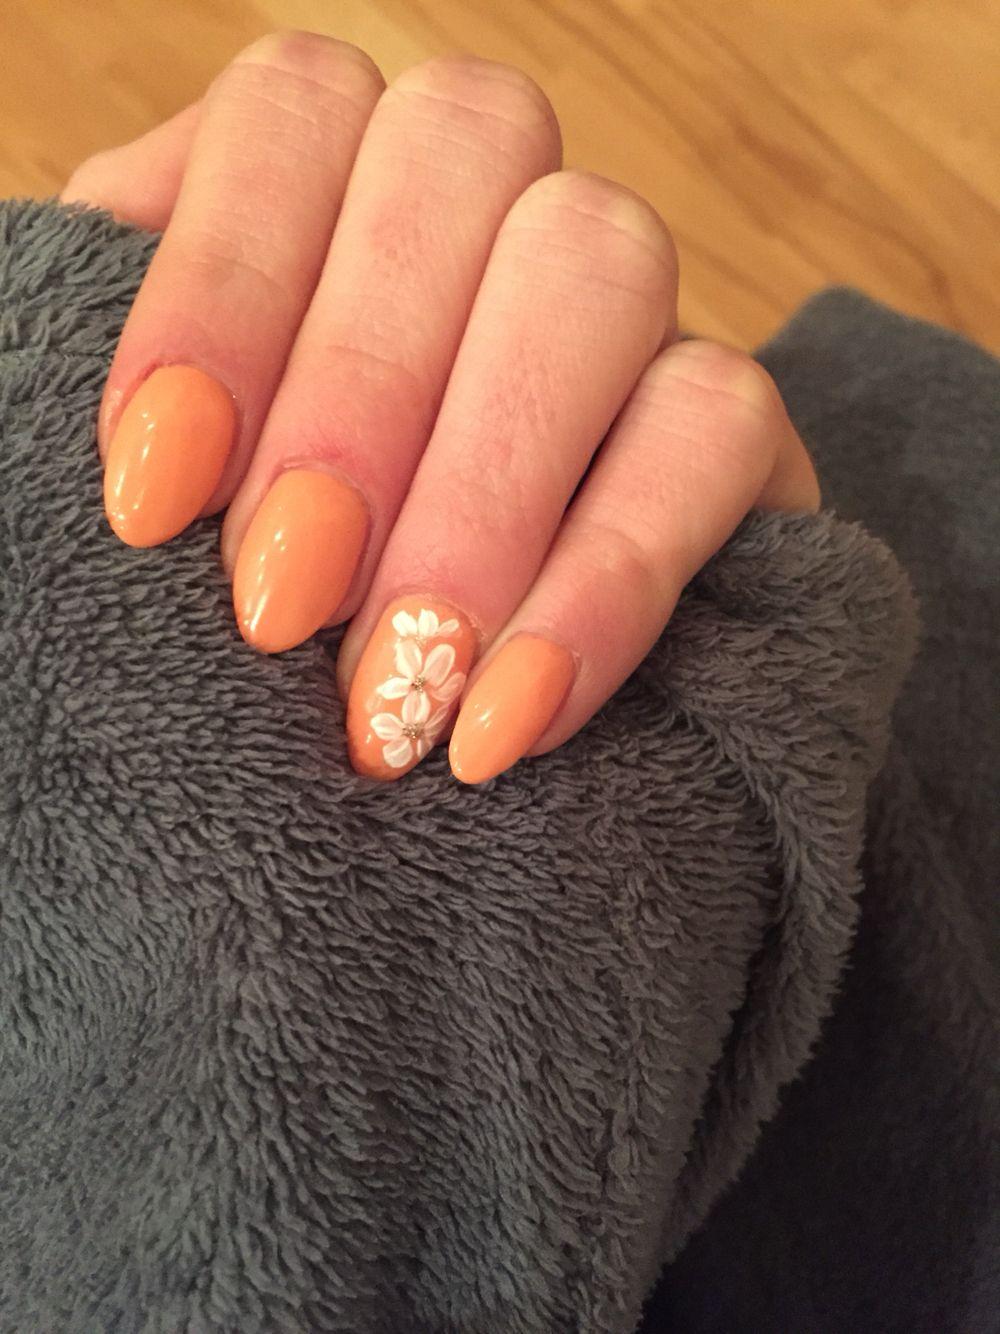 spitz#aprikot#muster#gel#nägel | Nägel | Pinterest | Gel-Nägel ...